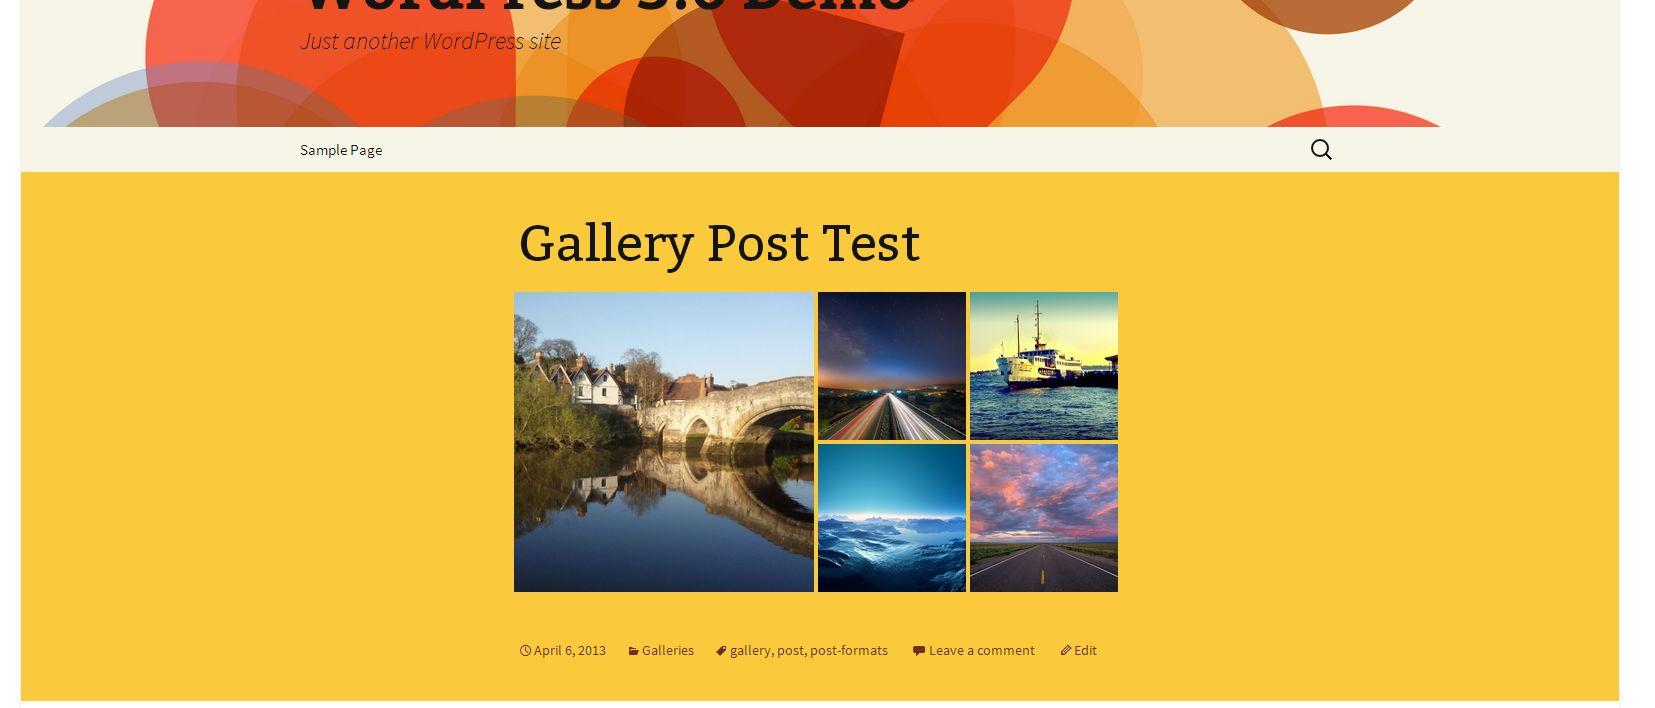 wp36-gallery-post-homepage